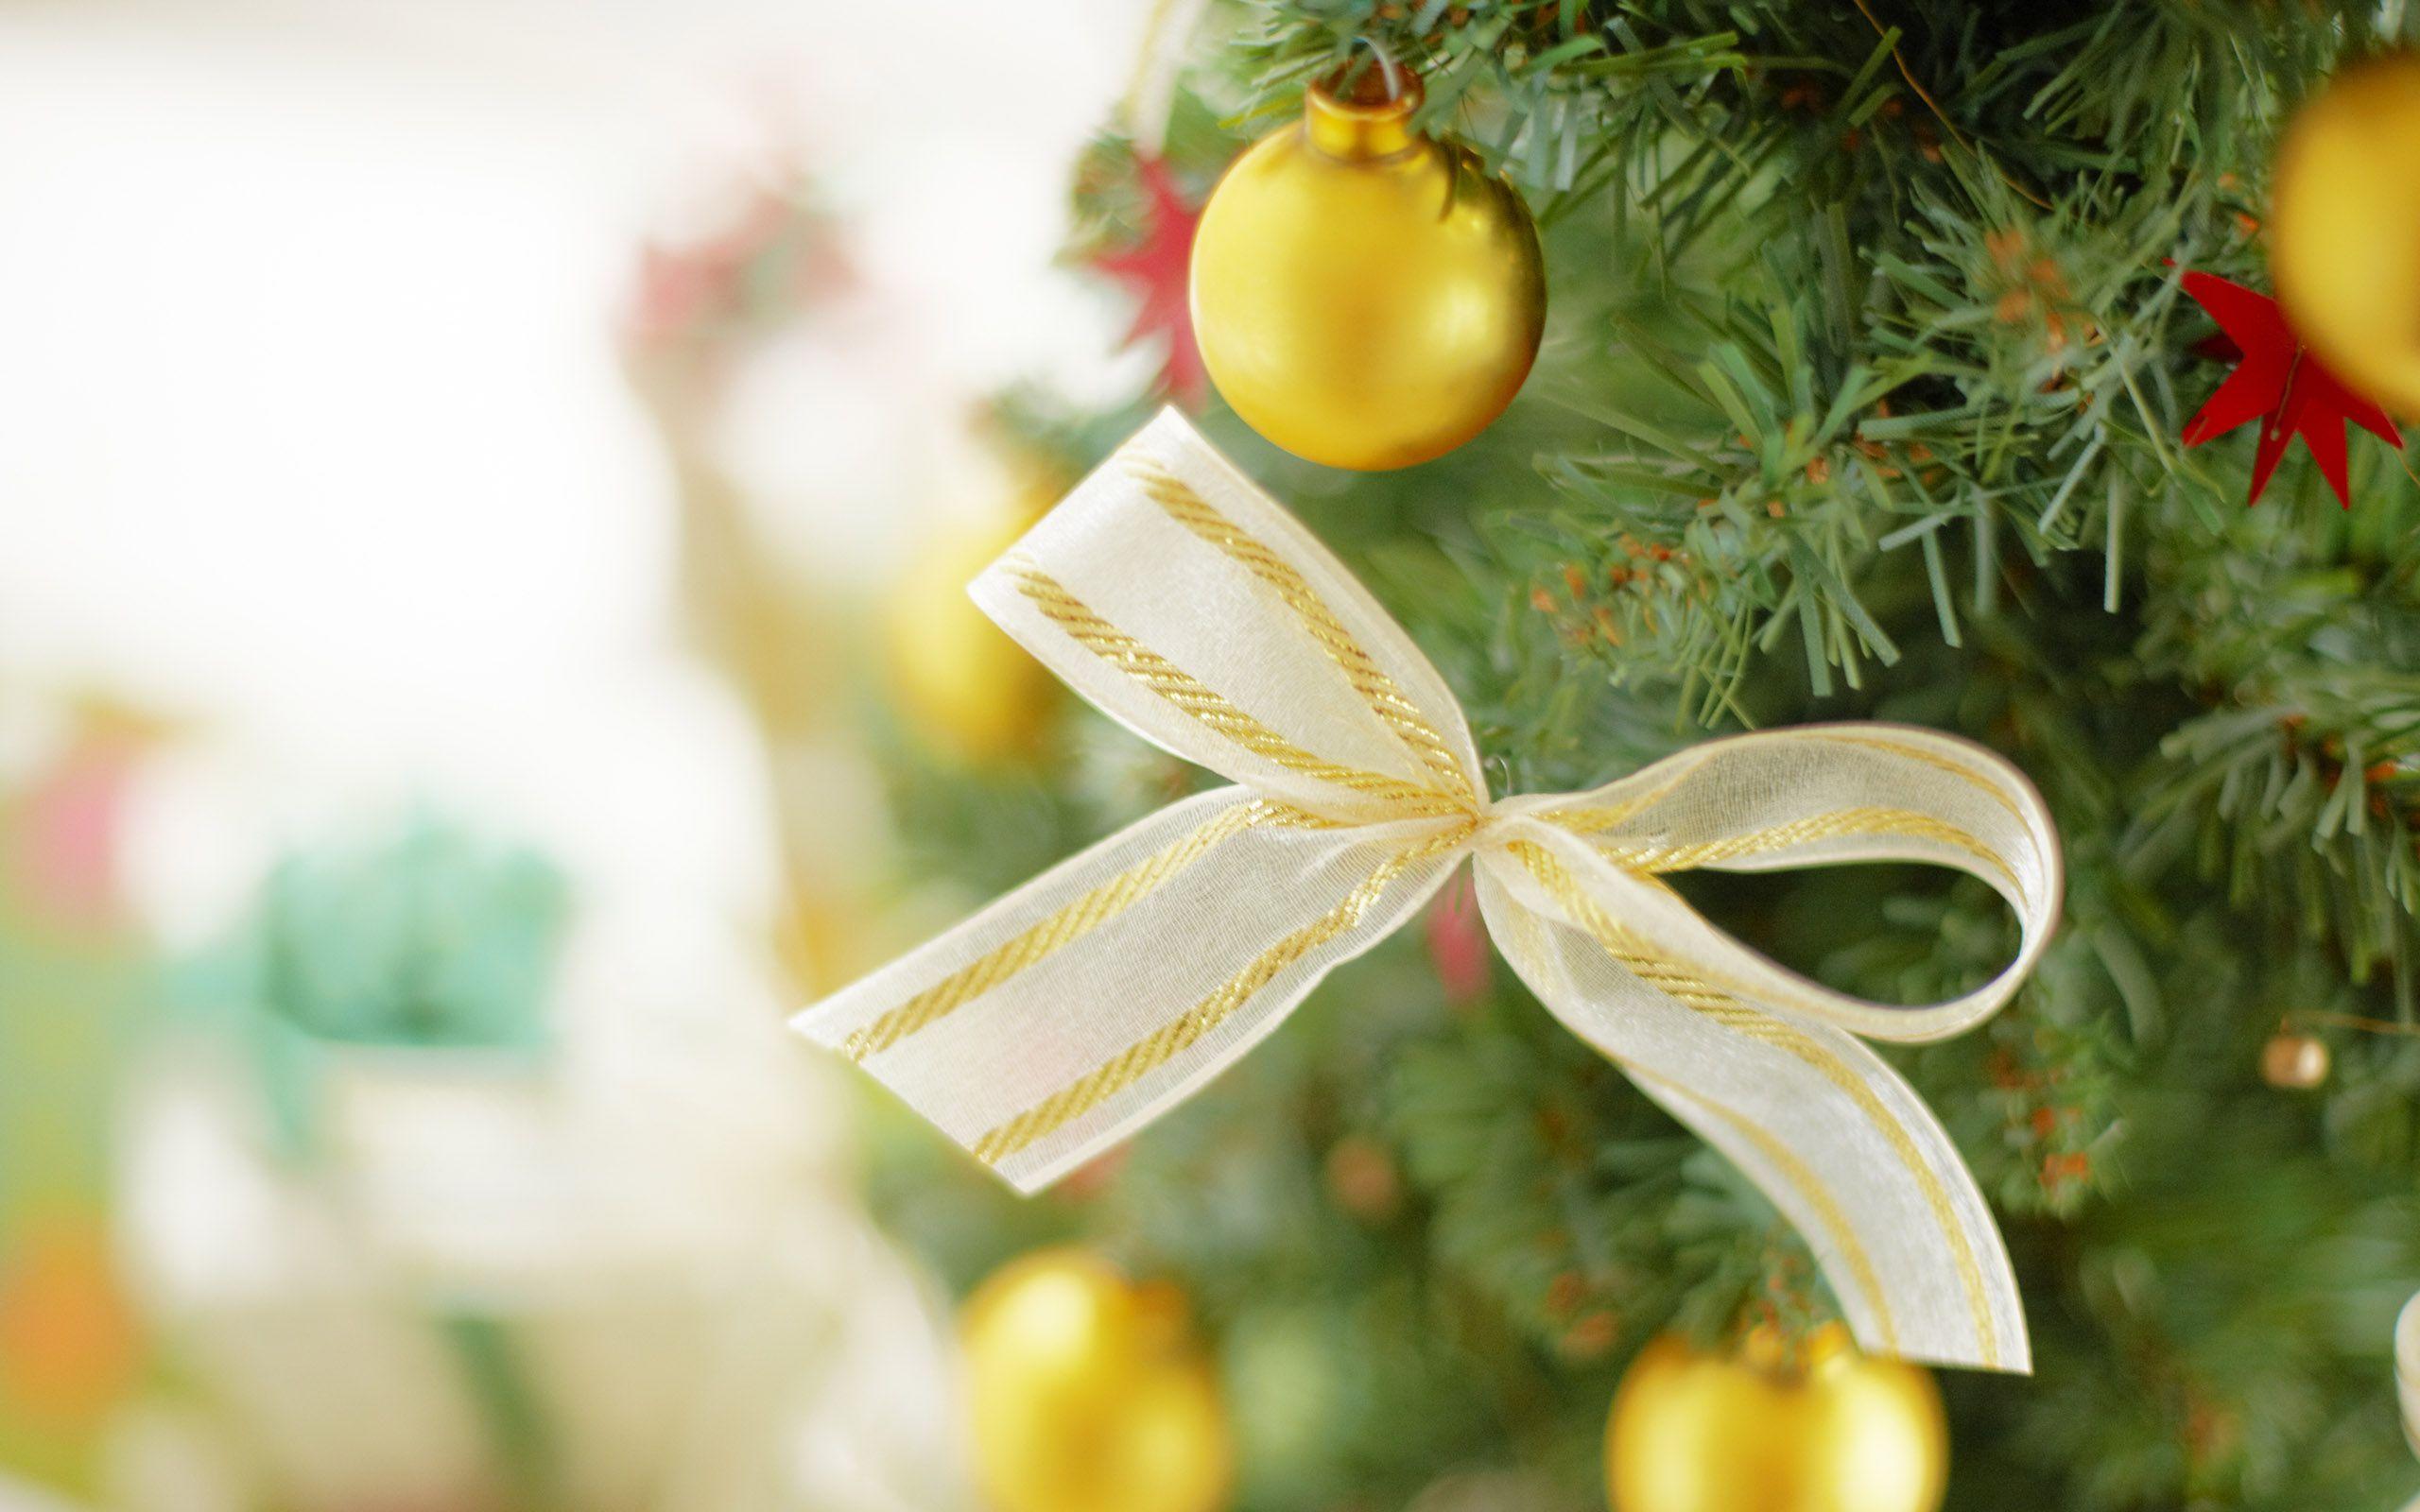 http://i3.imageban.ru/out/2011/12/27/abb67e743321e2e0b0b12ec6f804691b.jpg